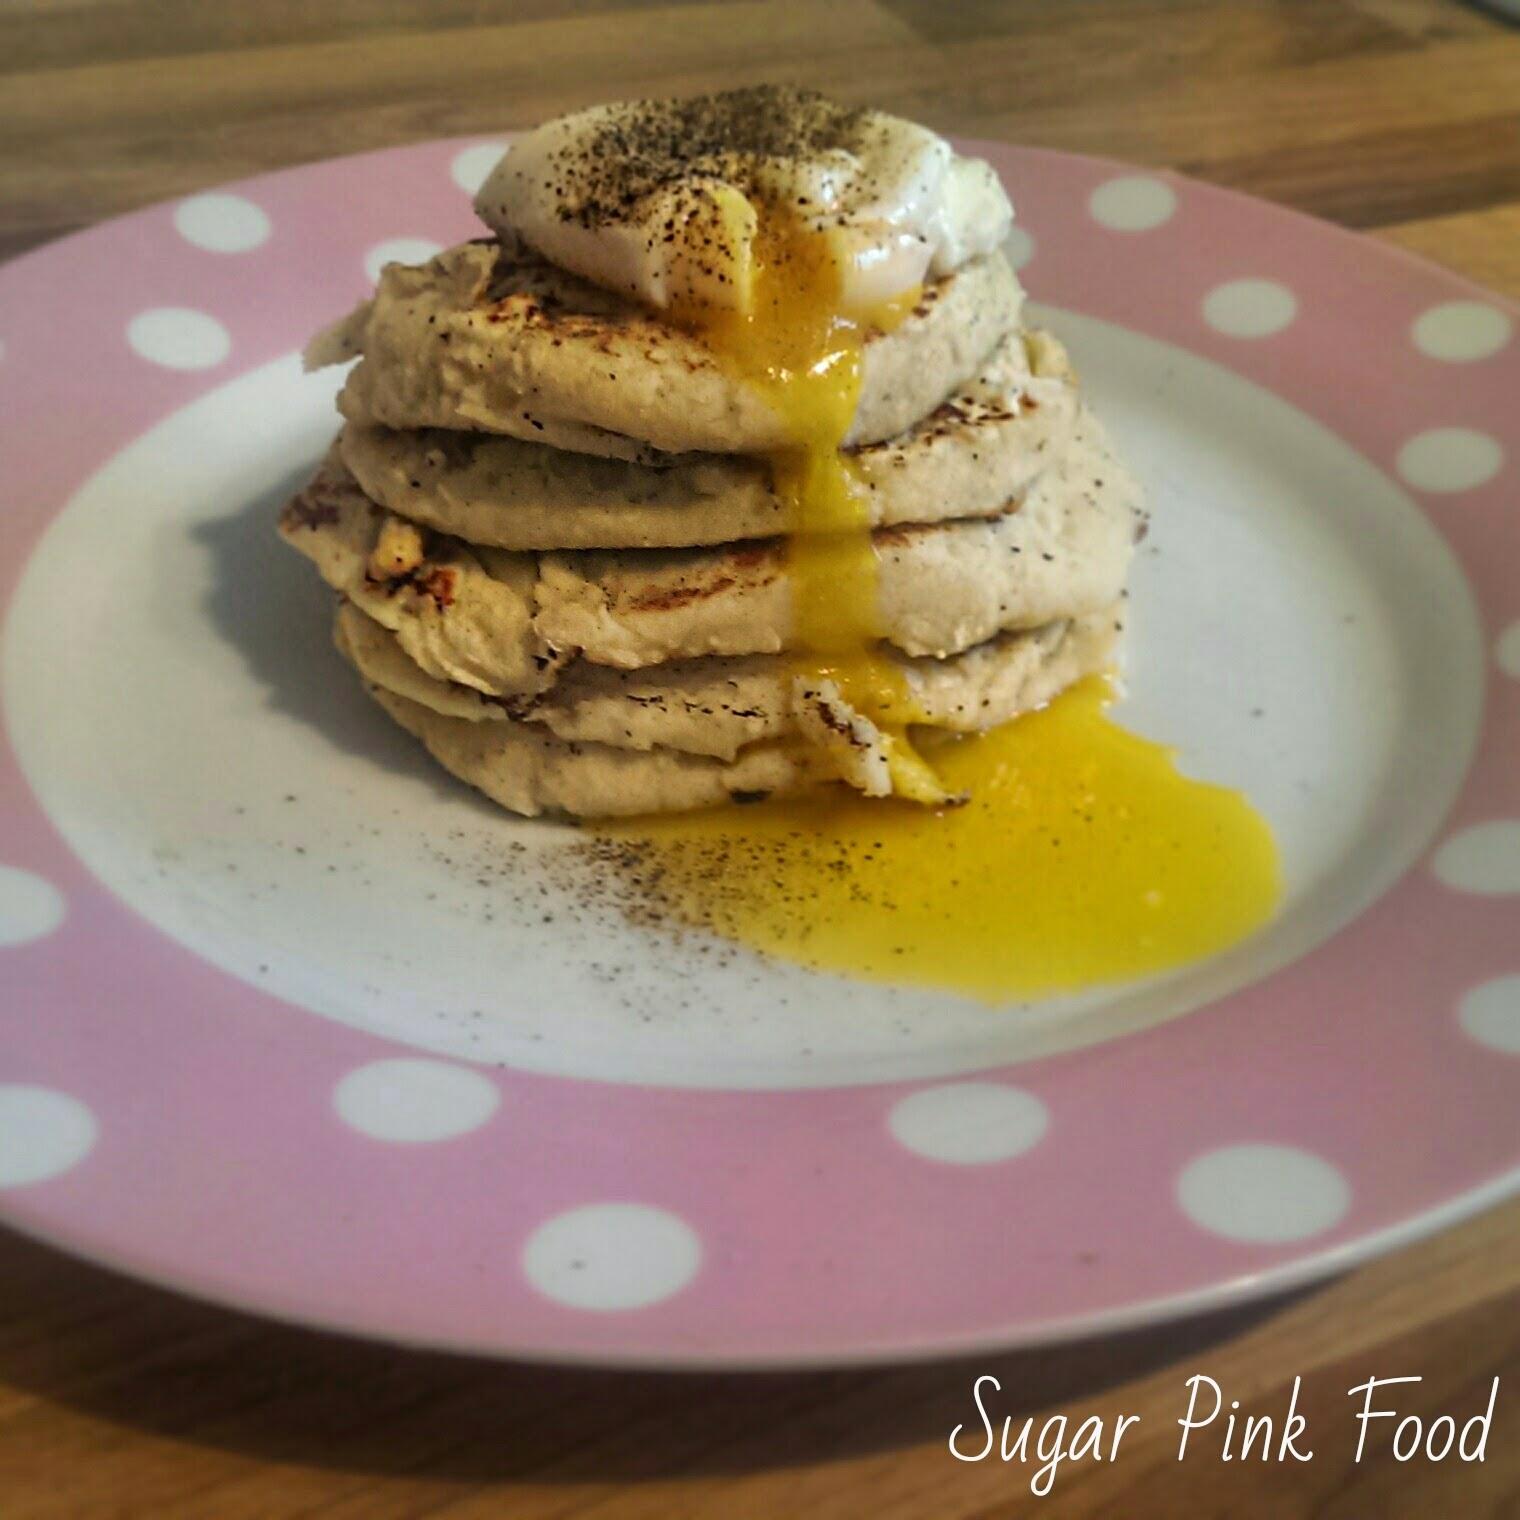 Sugar Pink Food: Slimming World Recipe: Savoury Potato ...